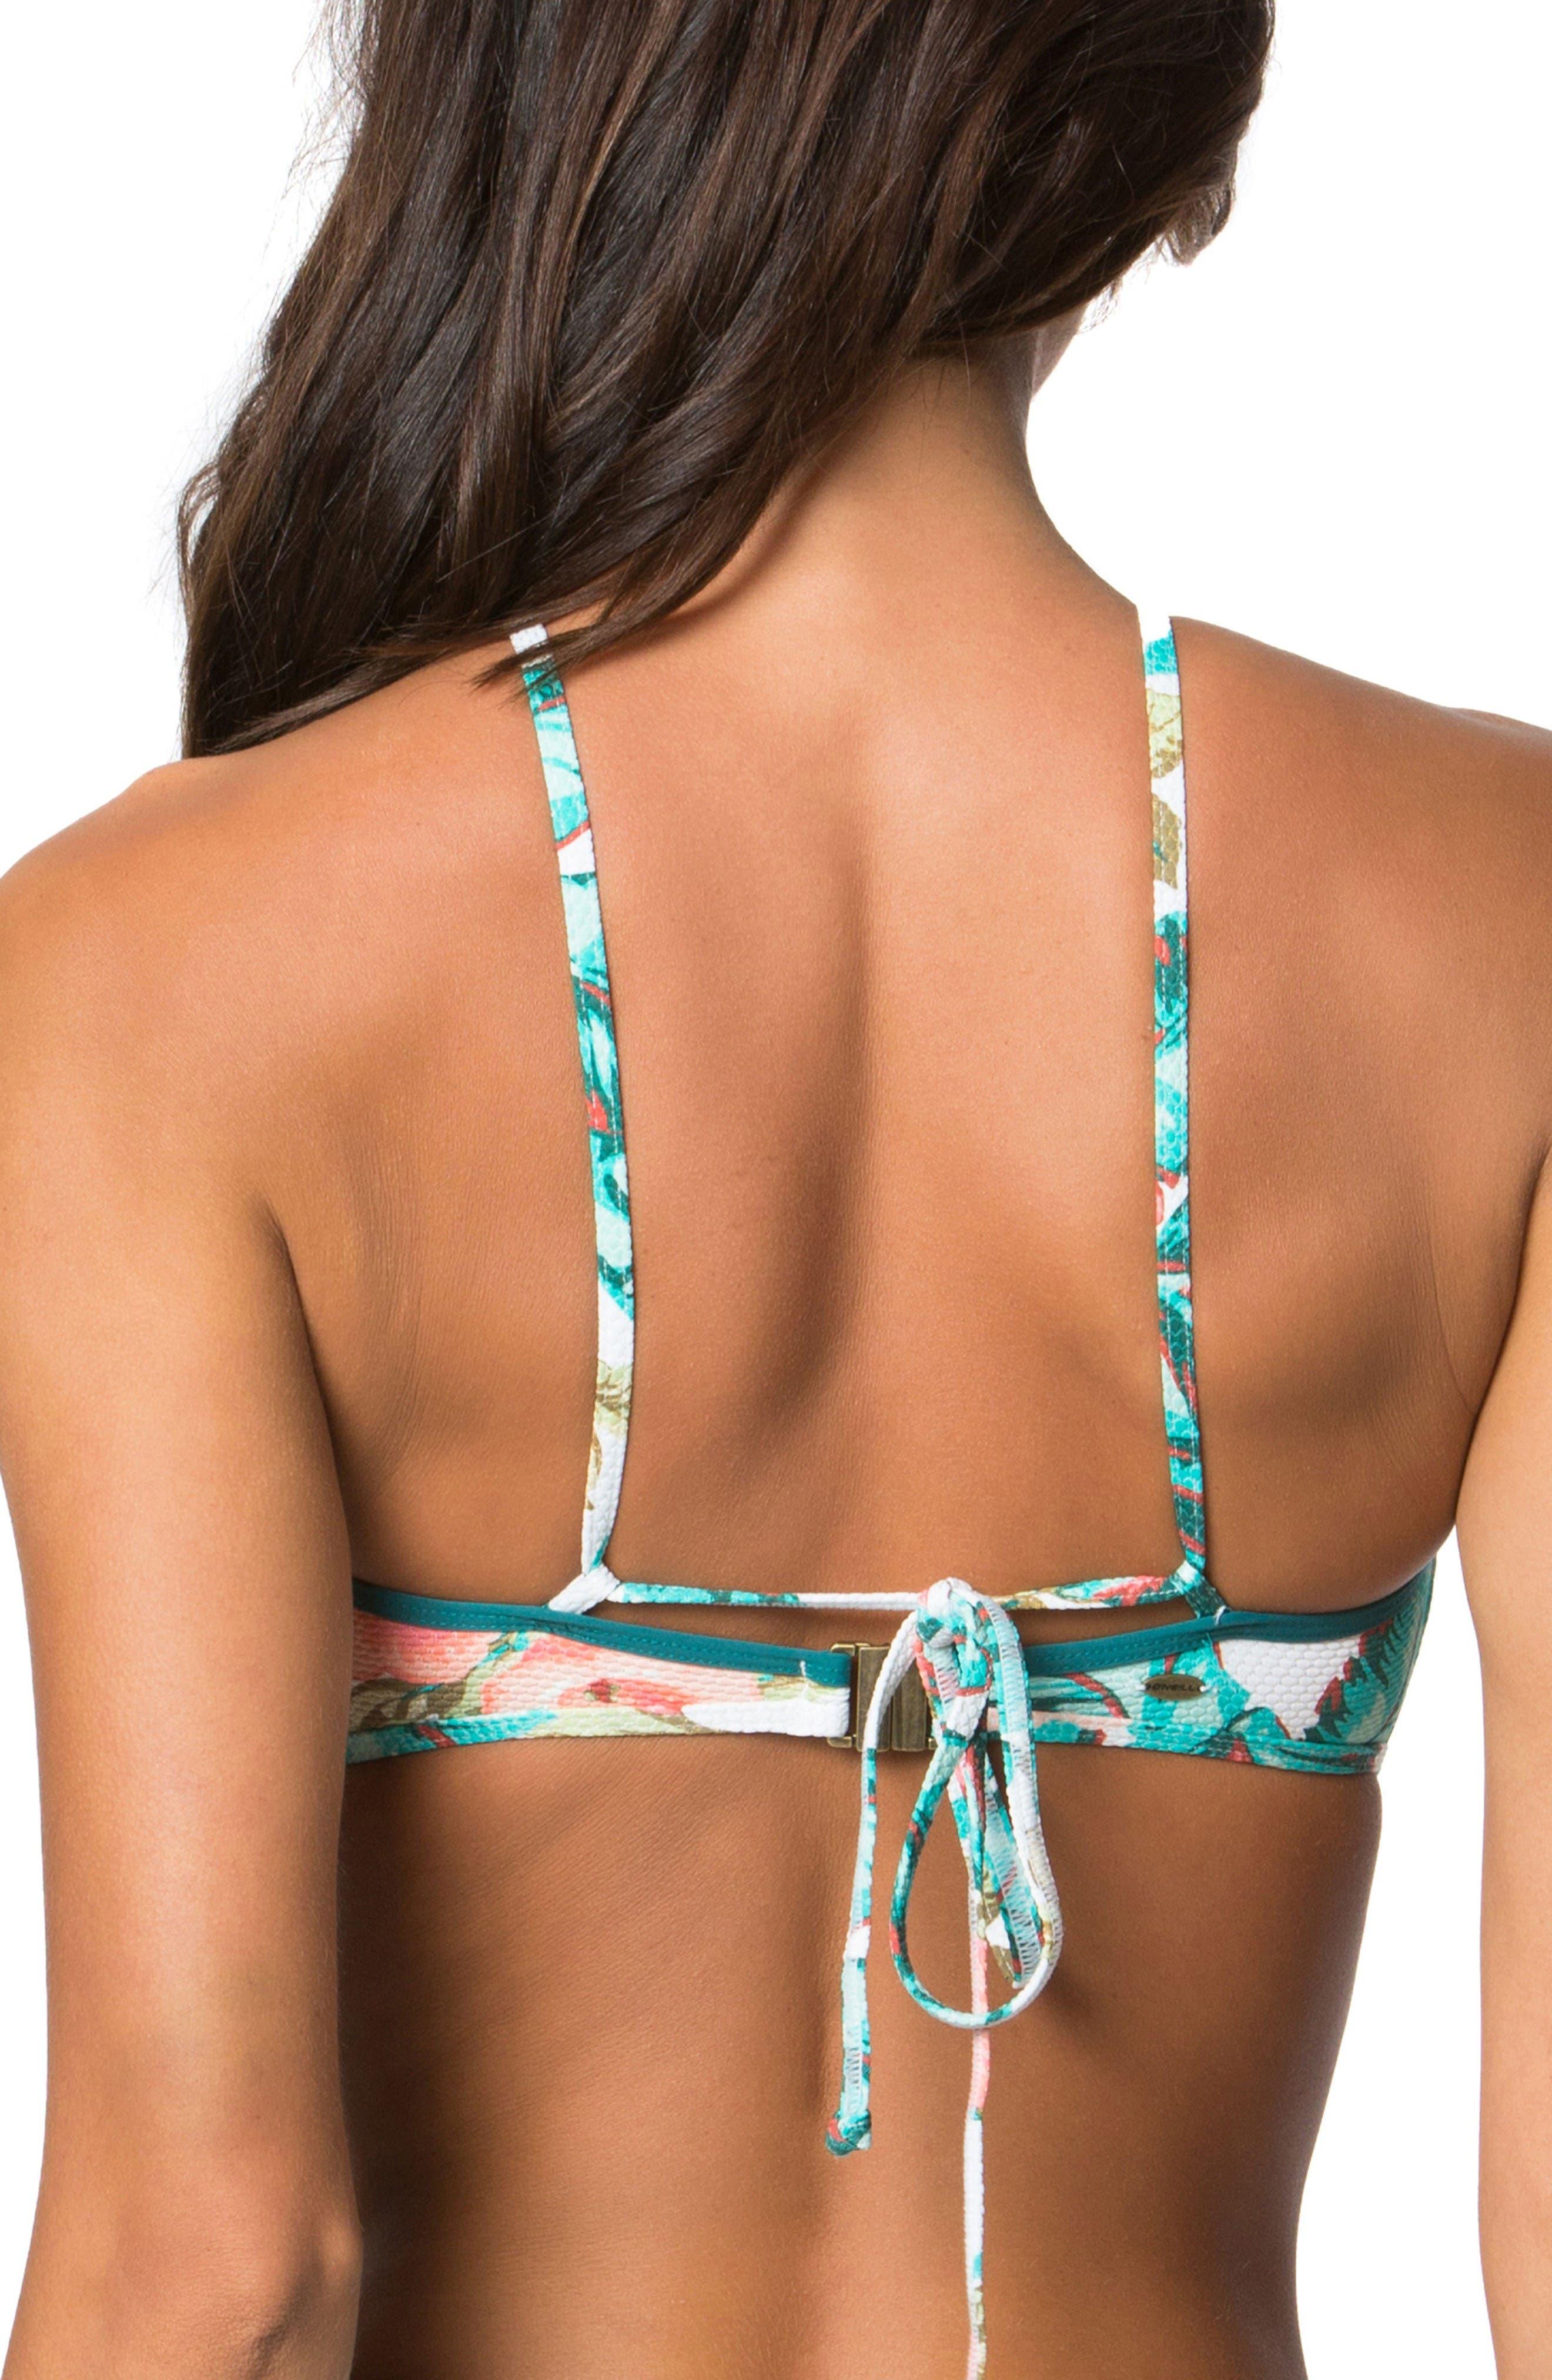 Alternate Image 3  - O'Neill x Natalie Off Duty Viva Bikini Top